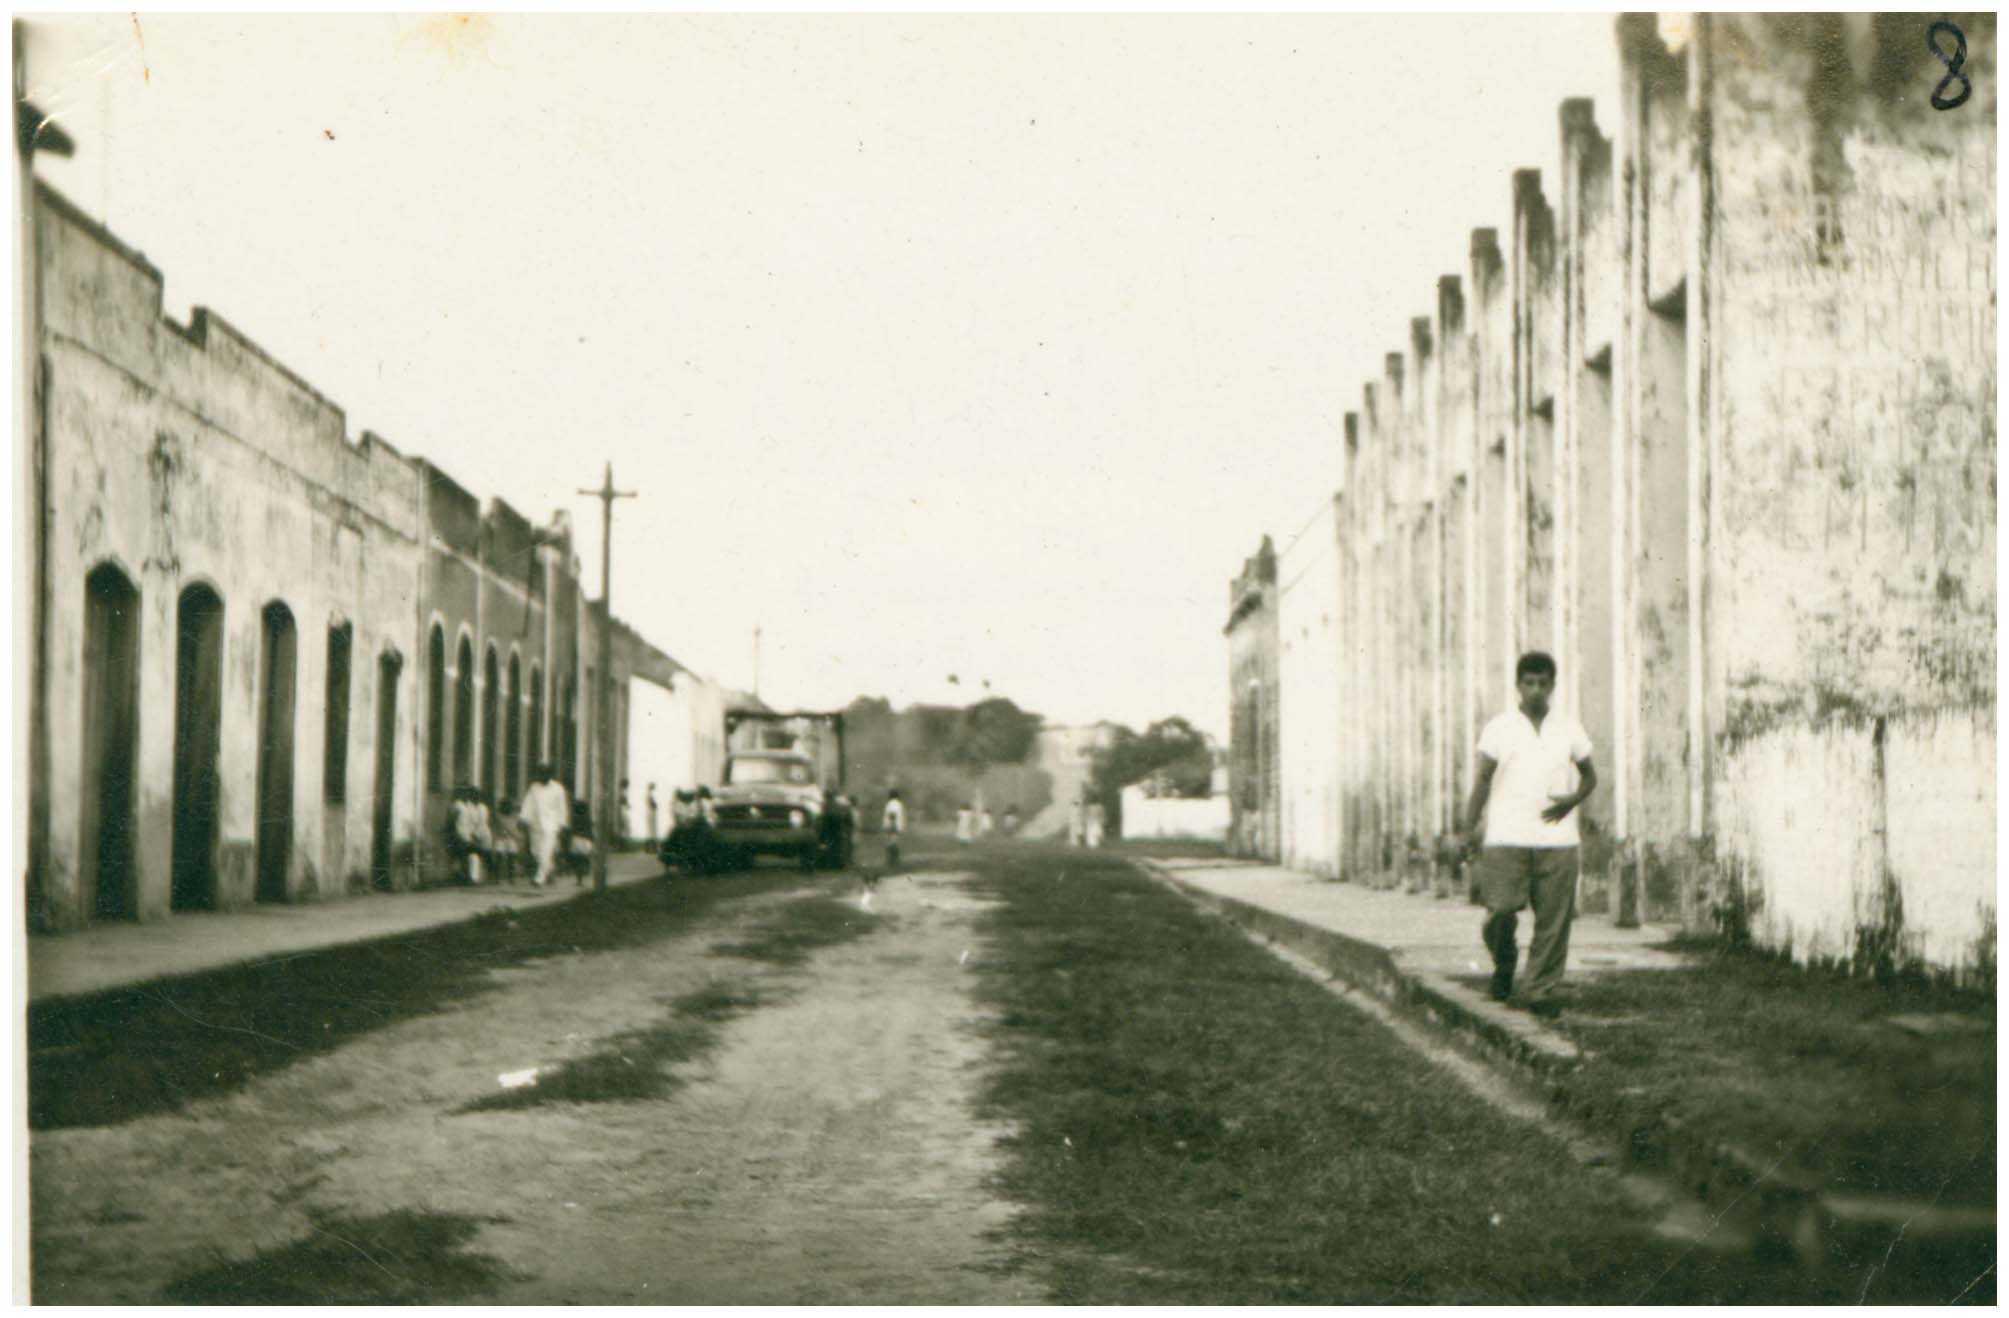 Rua Olavo Bilac : Tefé, AM - [19--] / Foto : IBGE